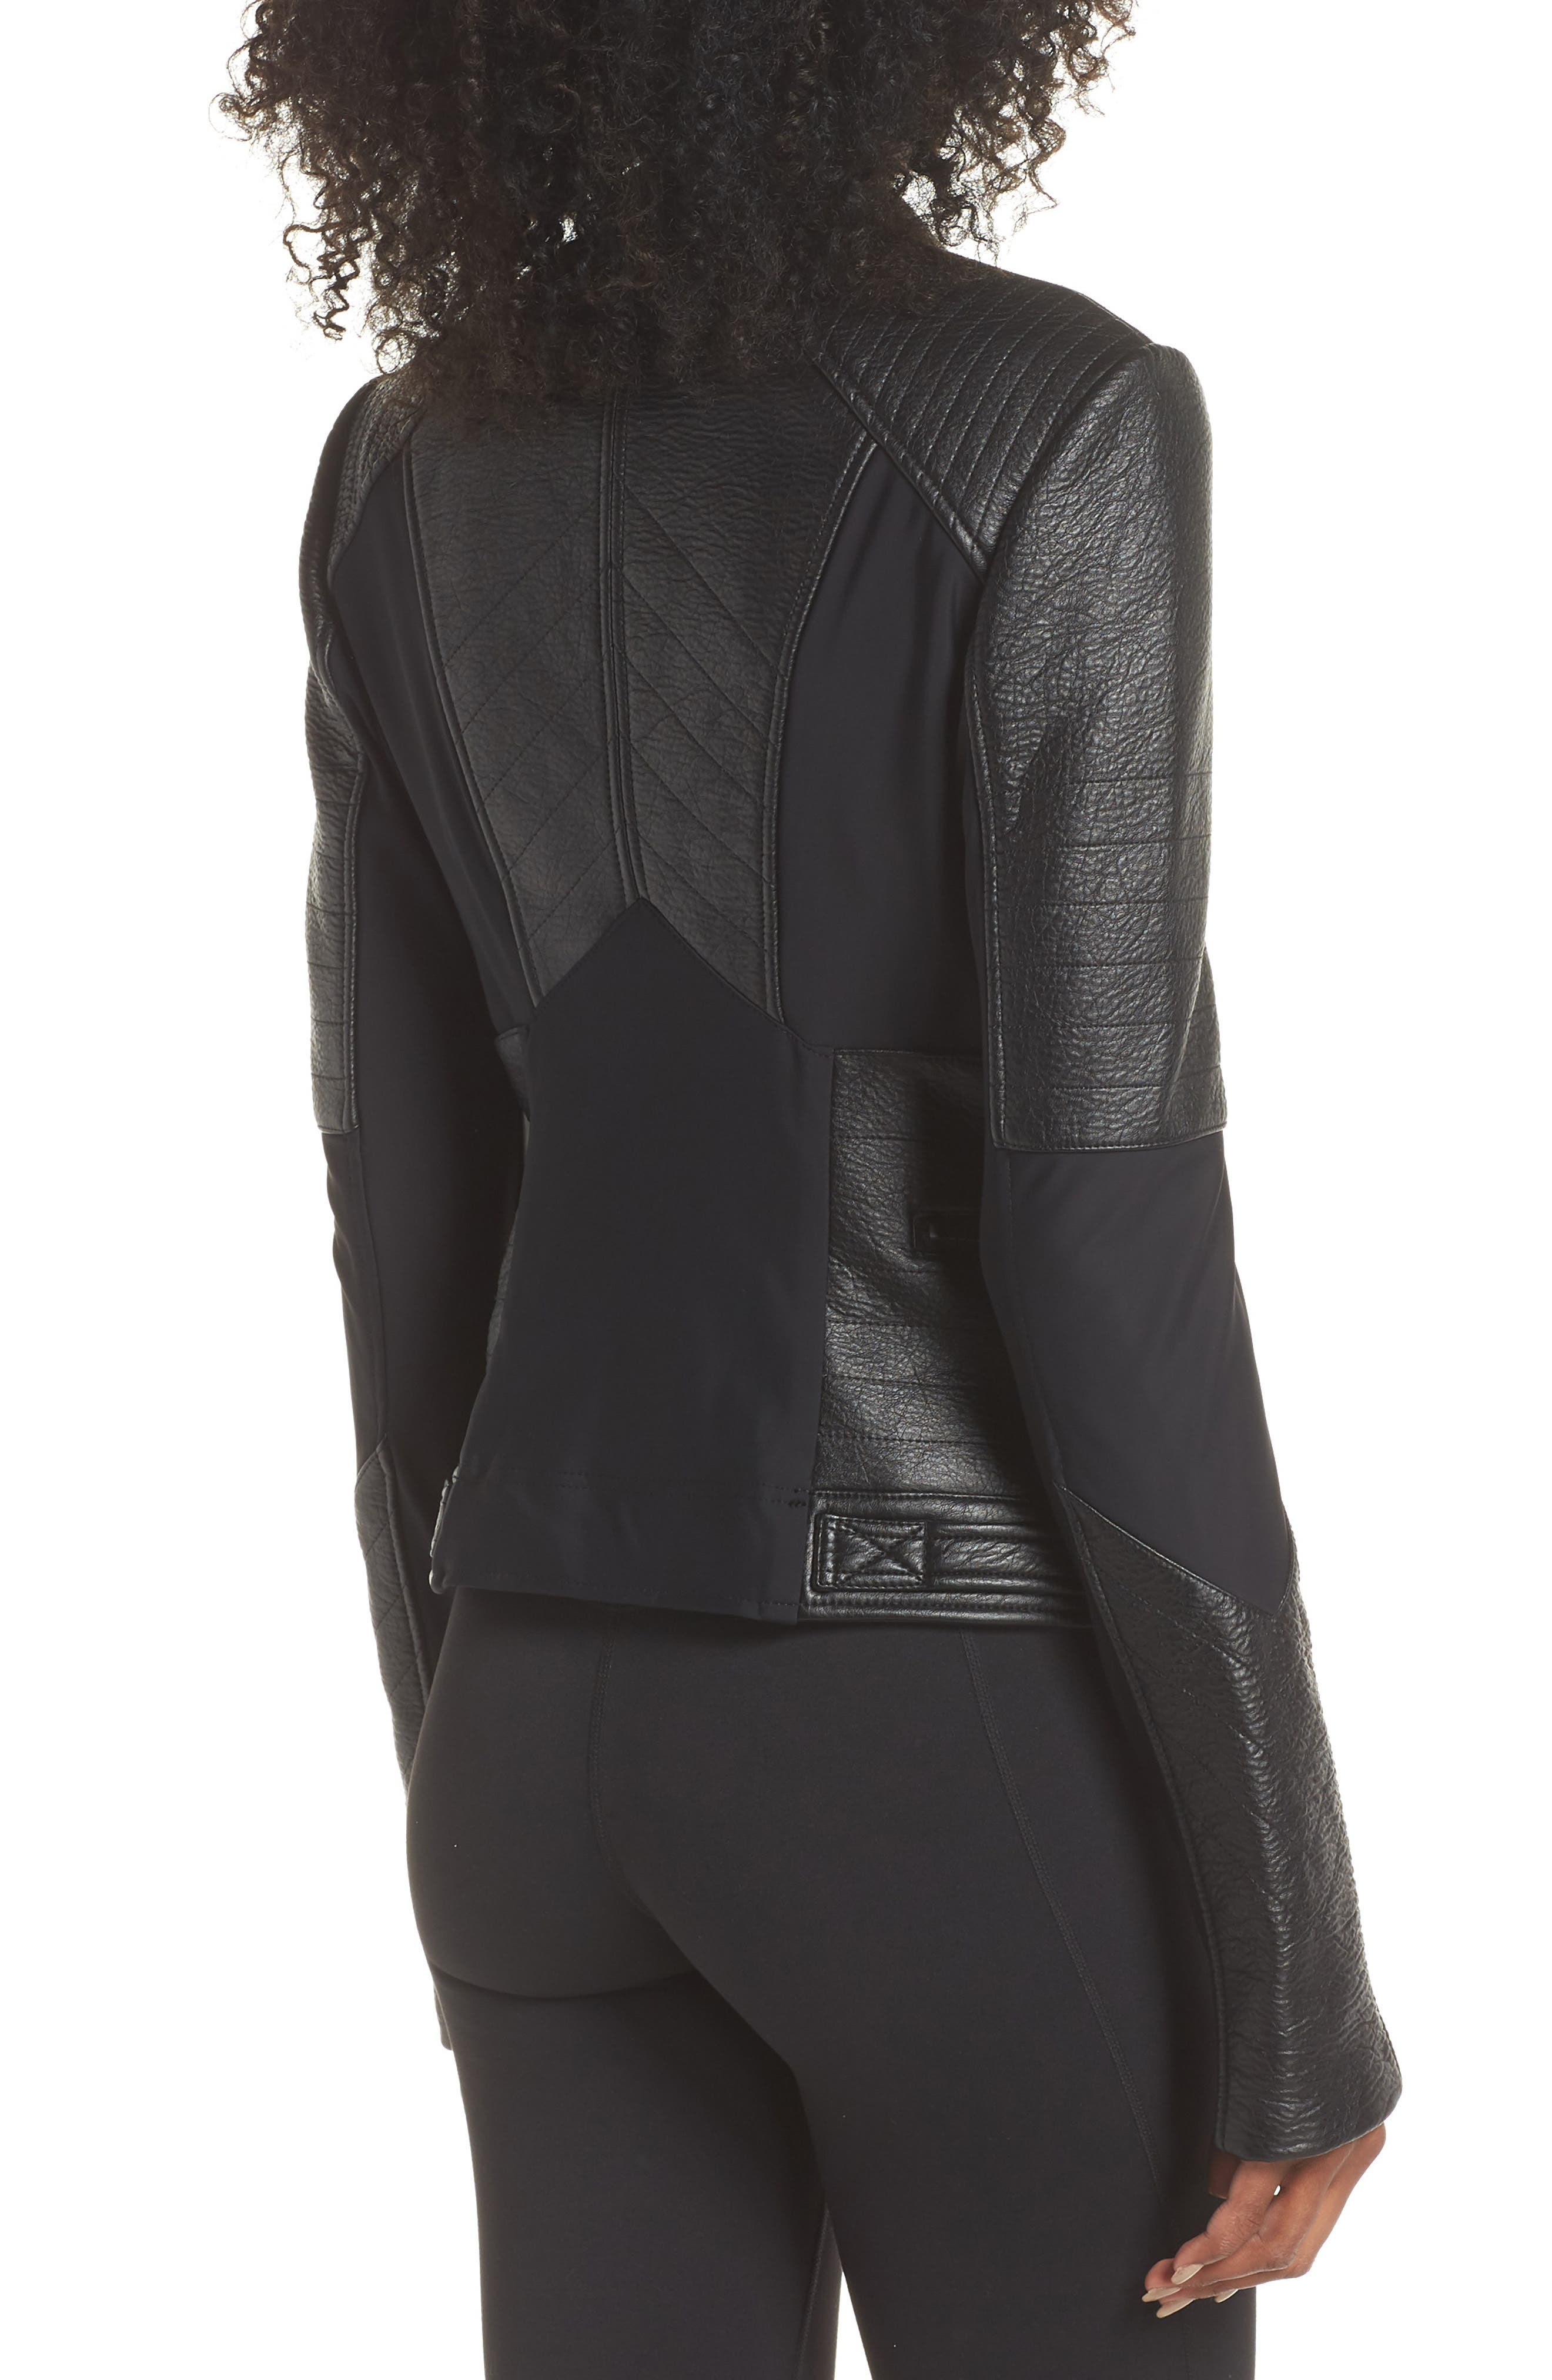 Ryder Faux Leather Moto Jacket,                             Alternate thumbnail 2, color,                             BLACK/ GREY